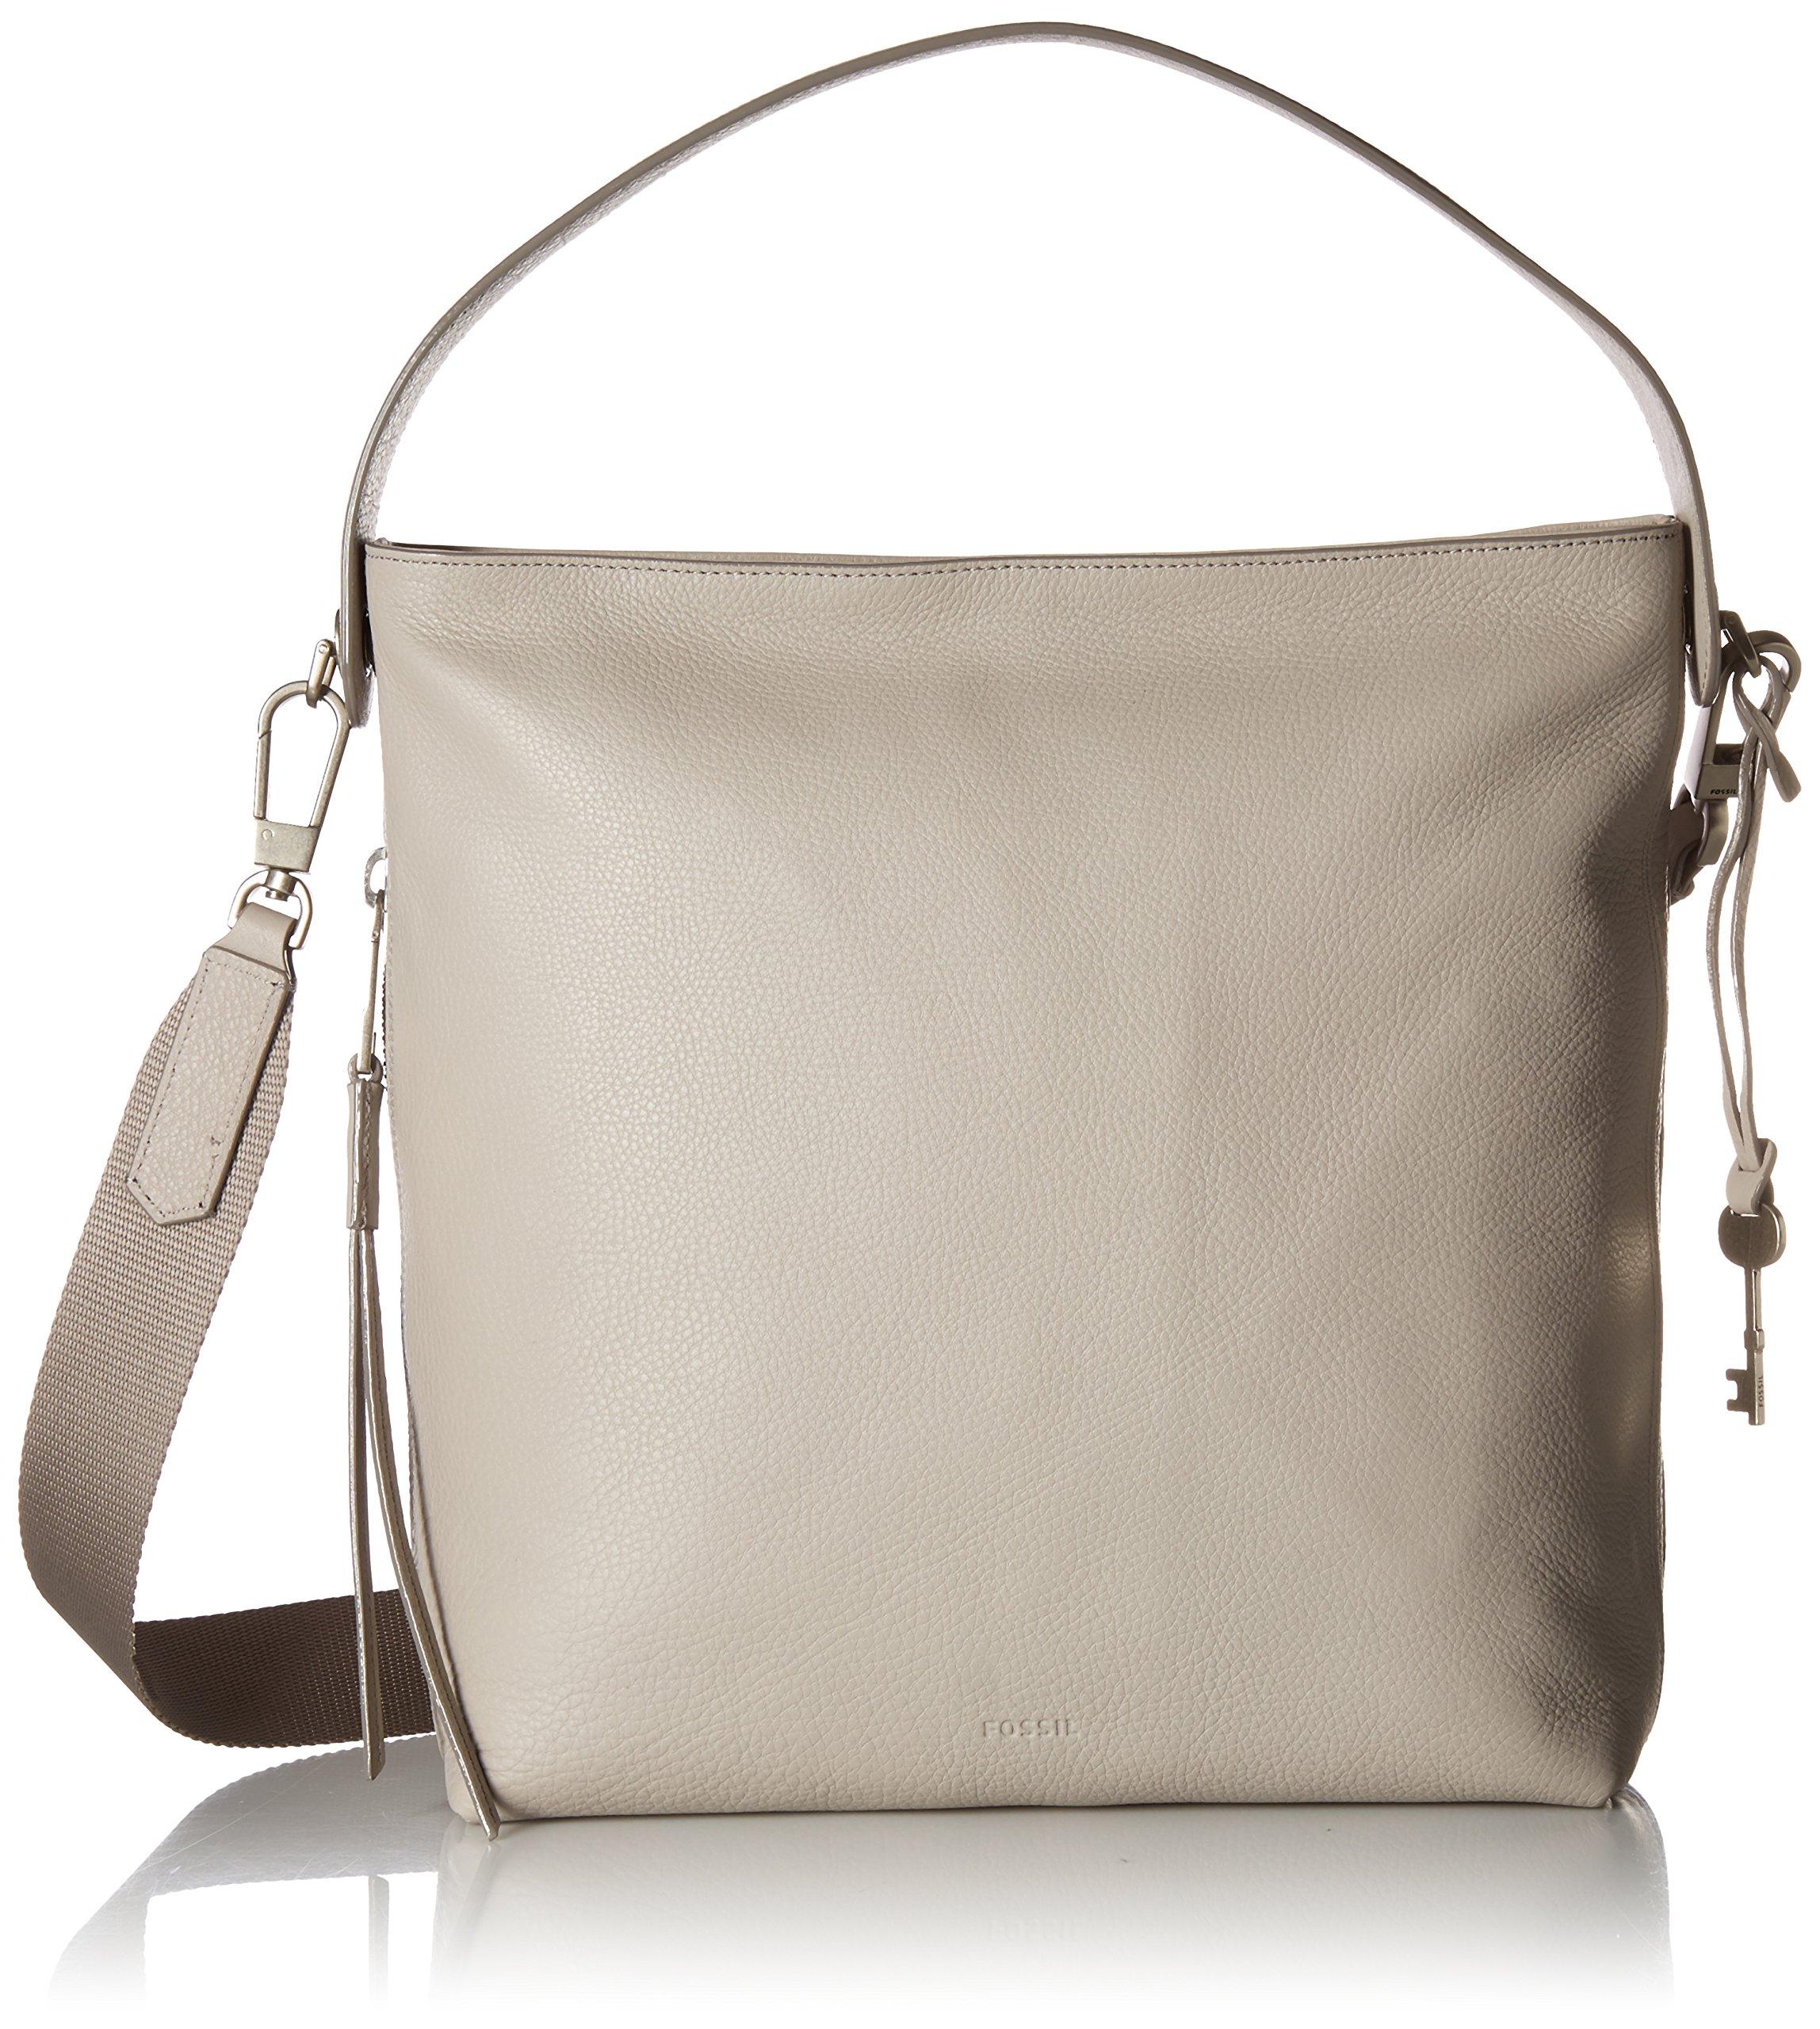 Fossil Maya Small HOBO Handbag, Mineral Gray